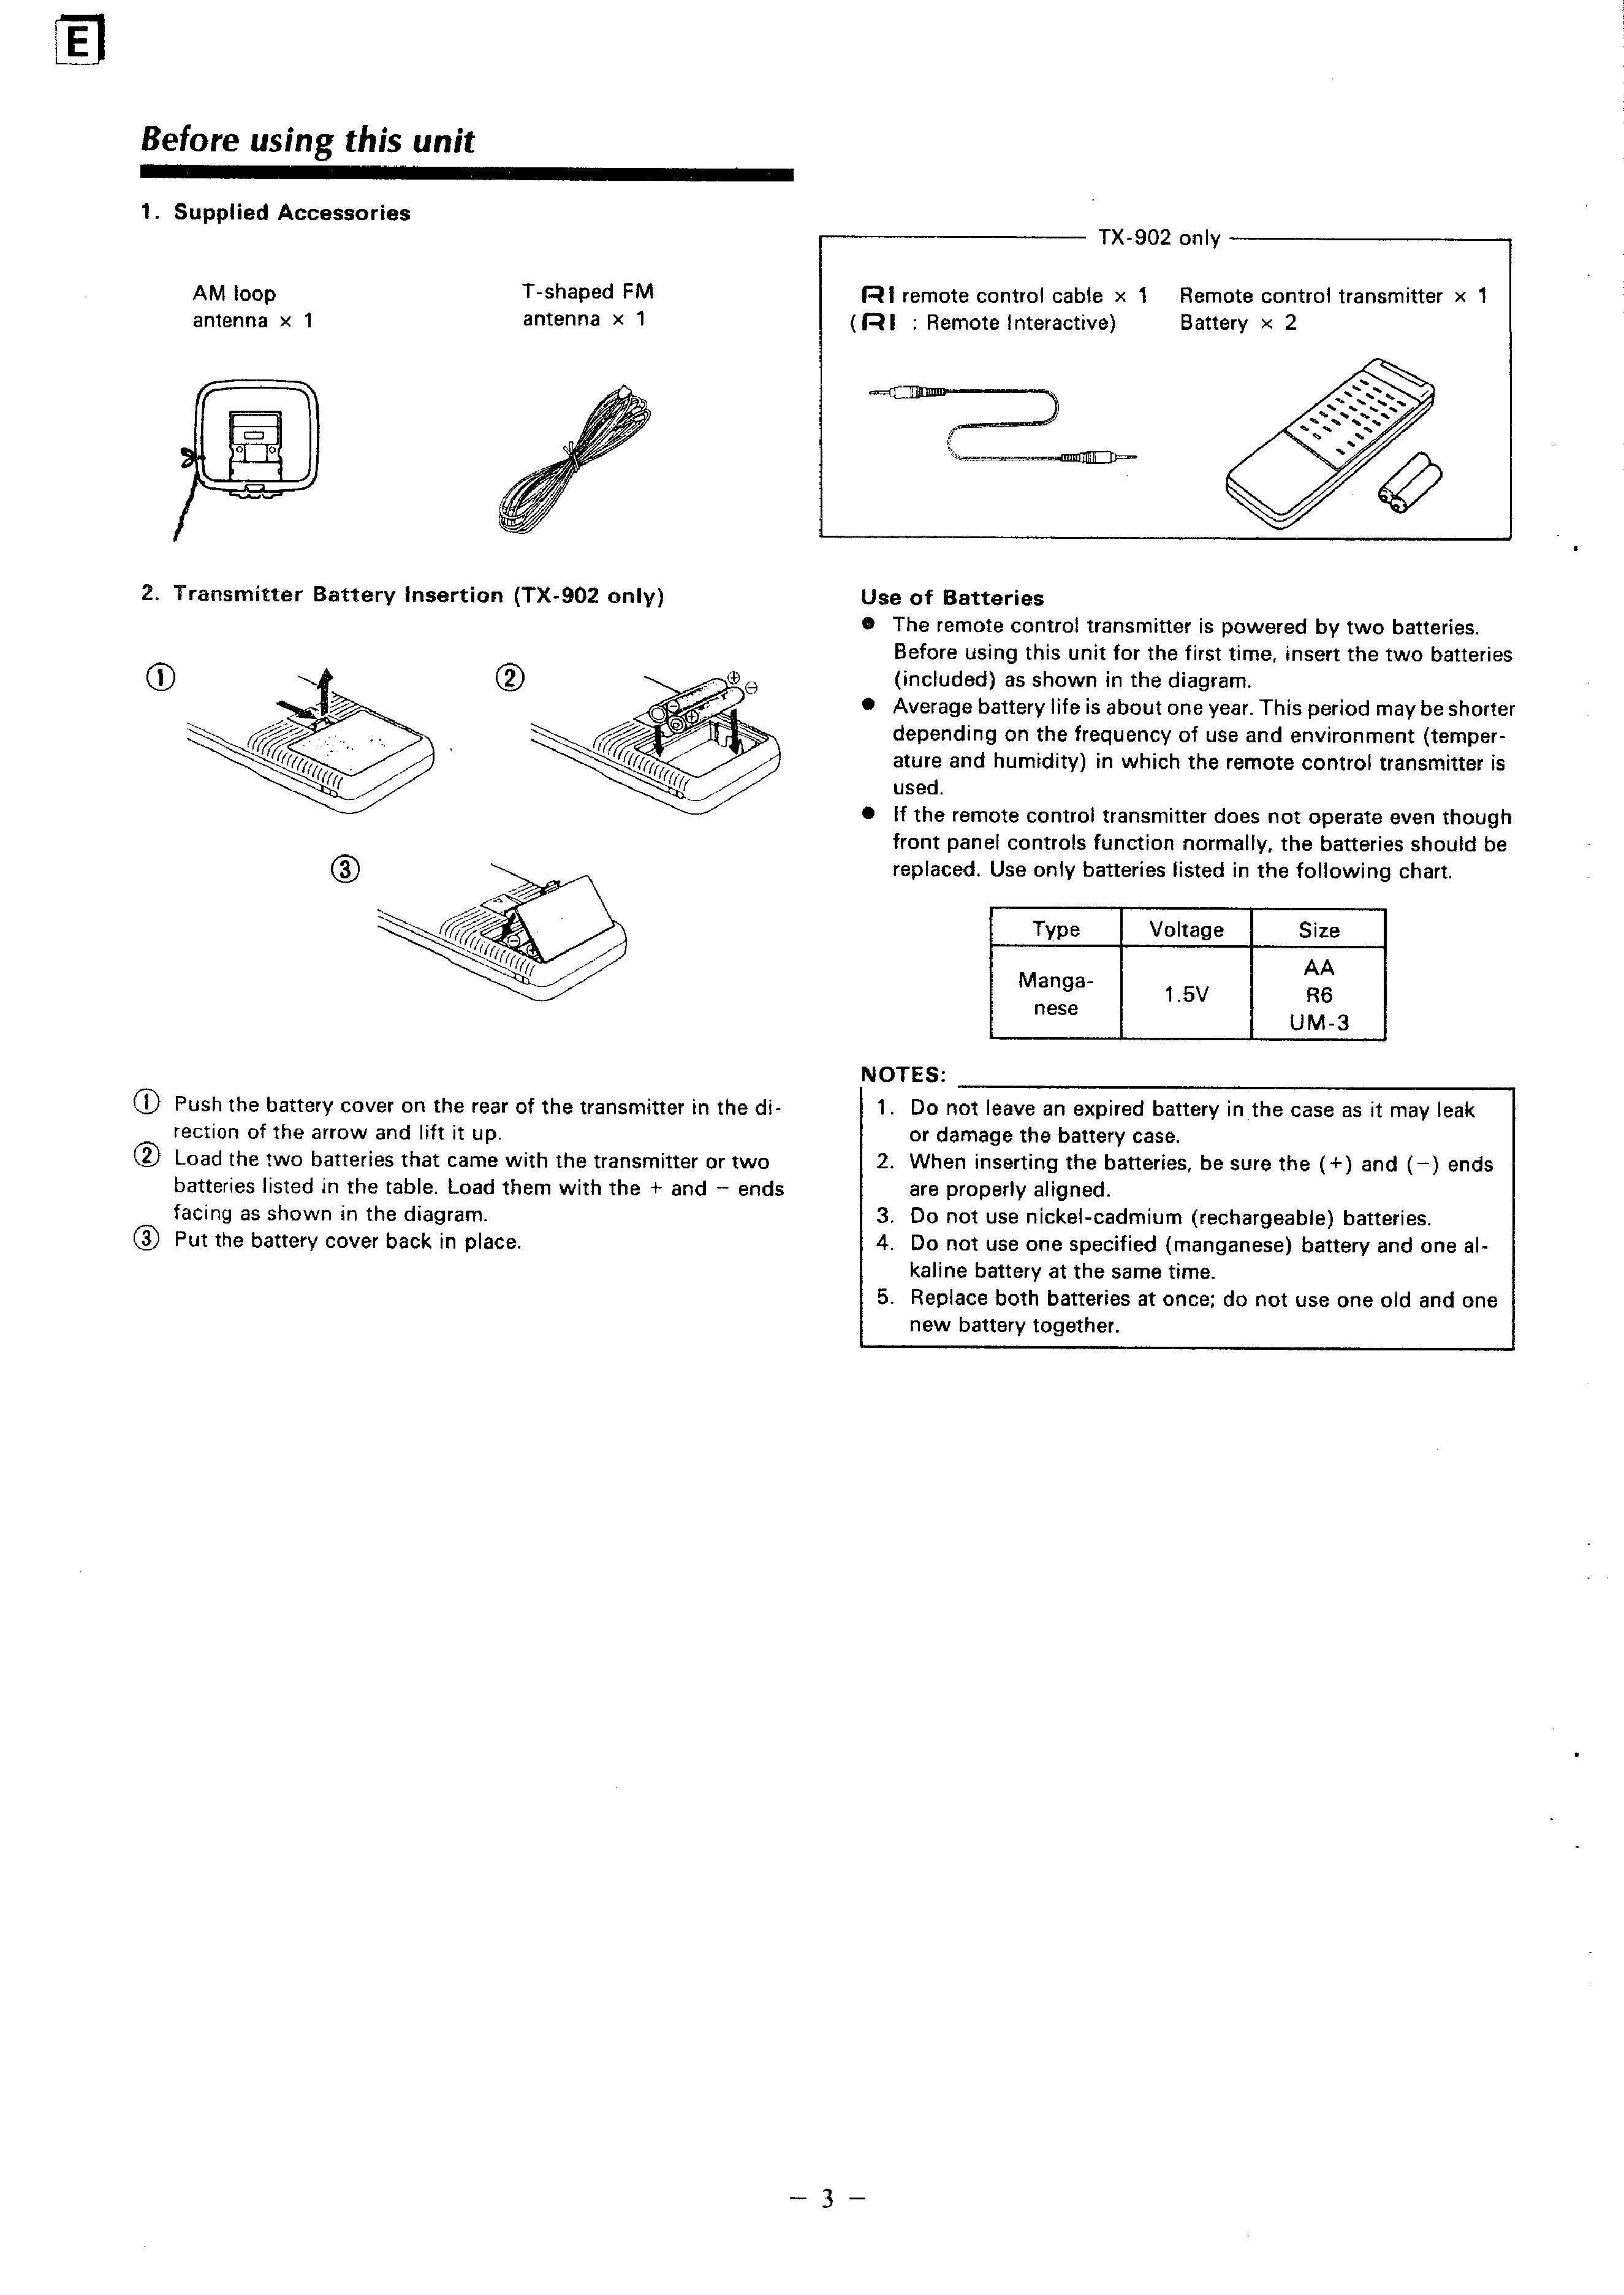 Onkyo tx Sv454 User Manual on